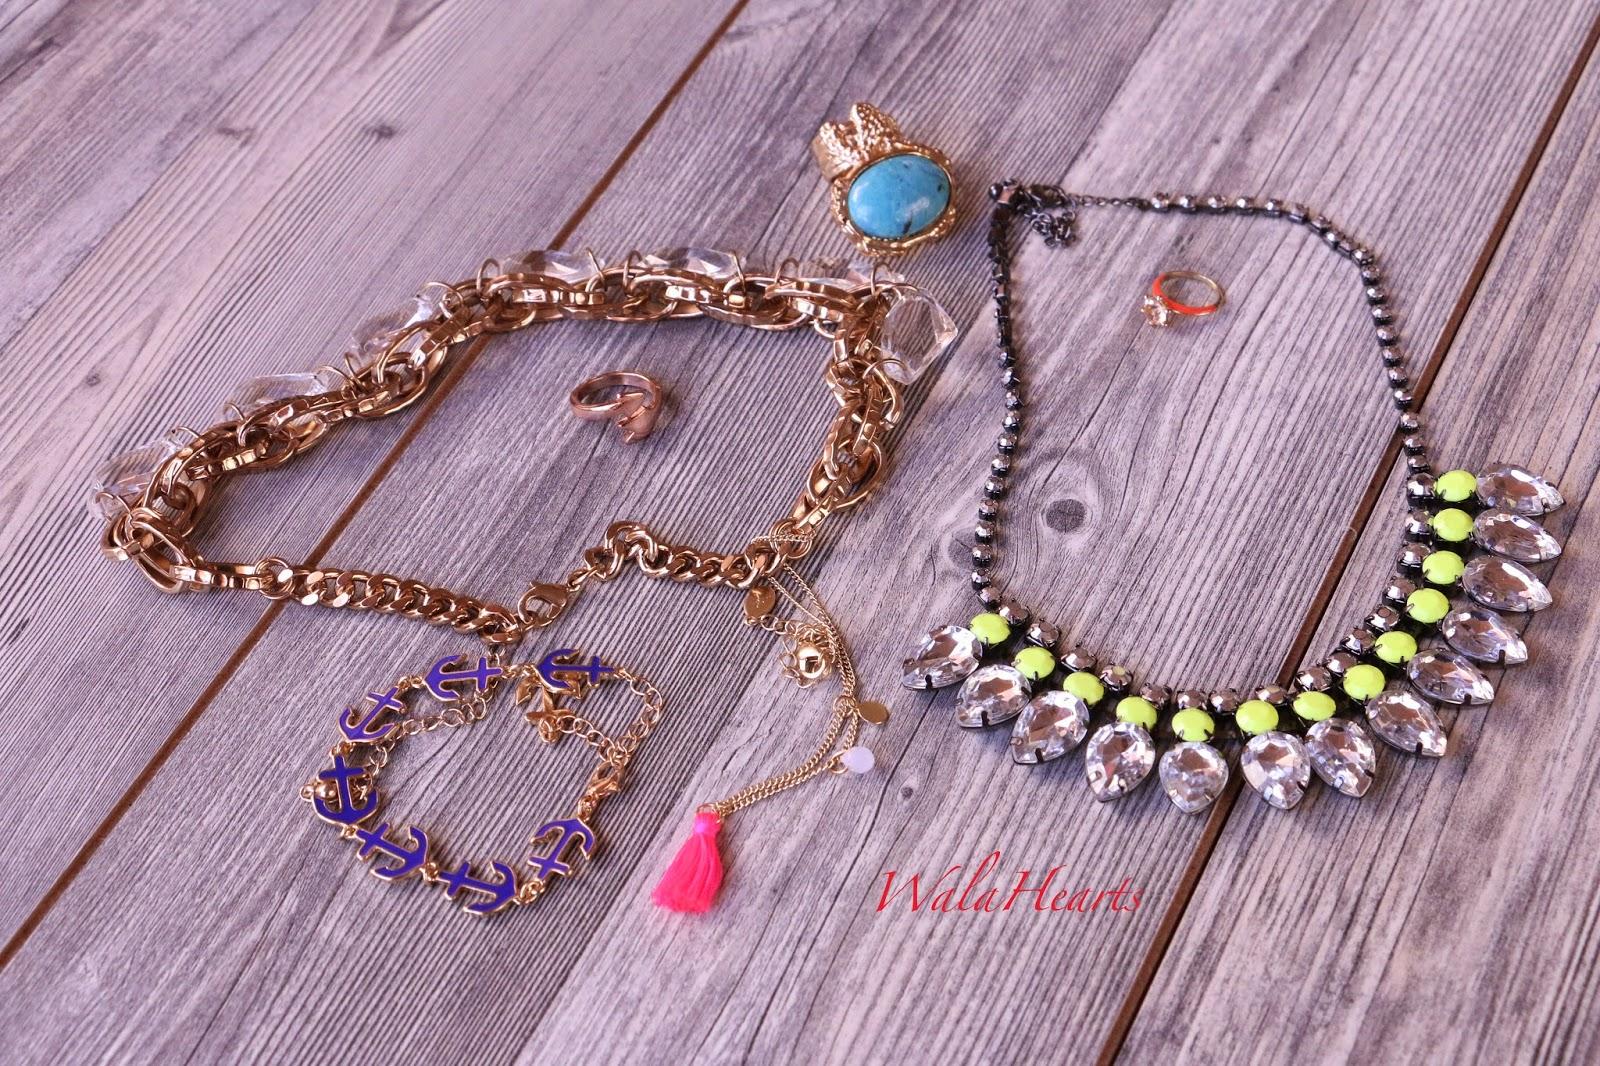 c078da81d My Summer essentials | WalaHearts | Bloglovin'